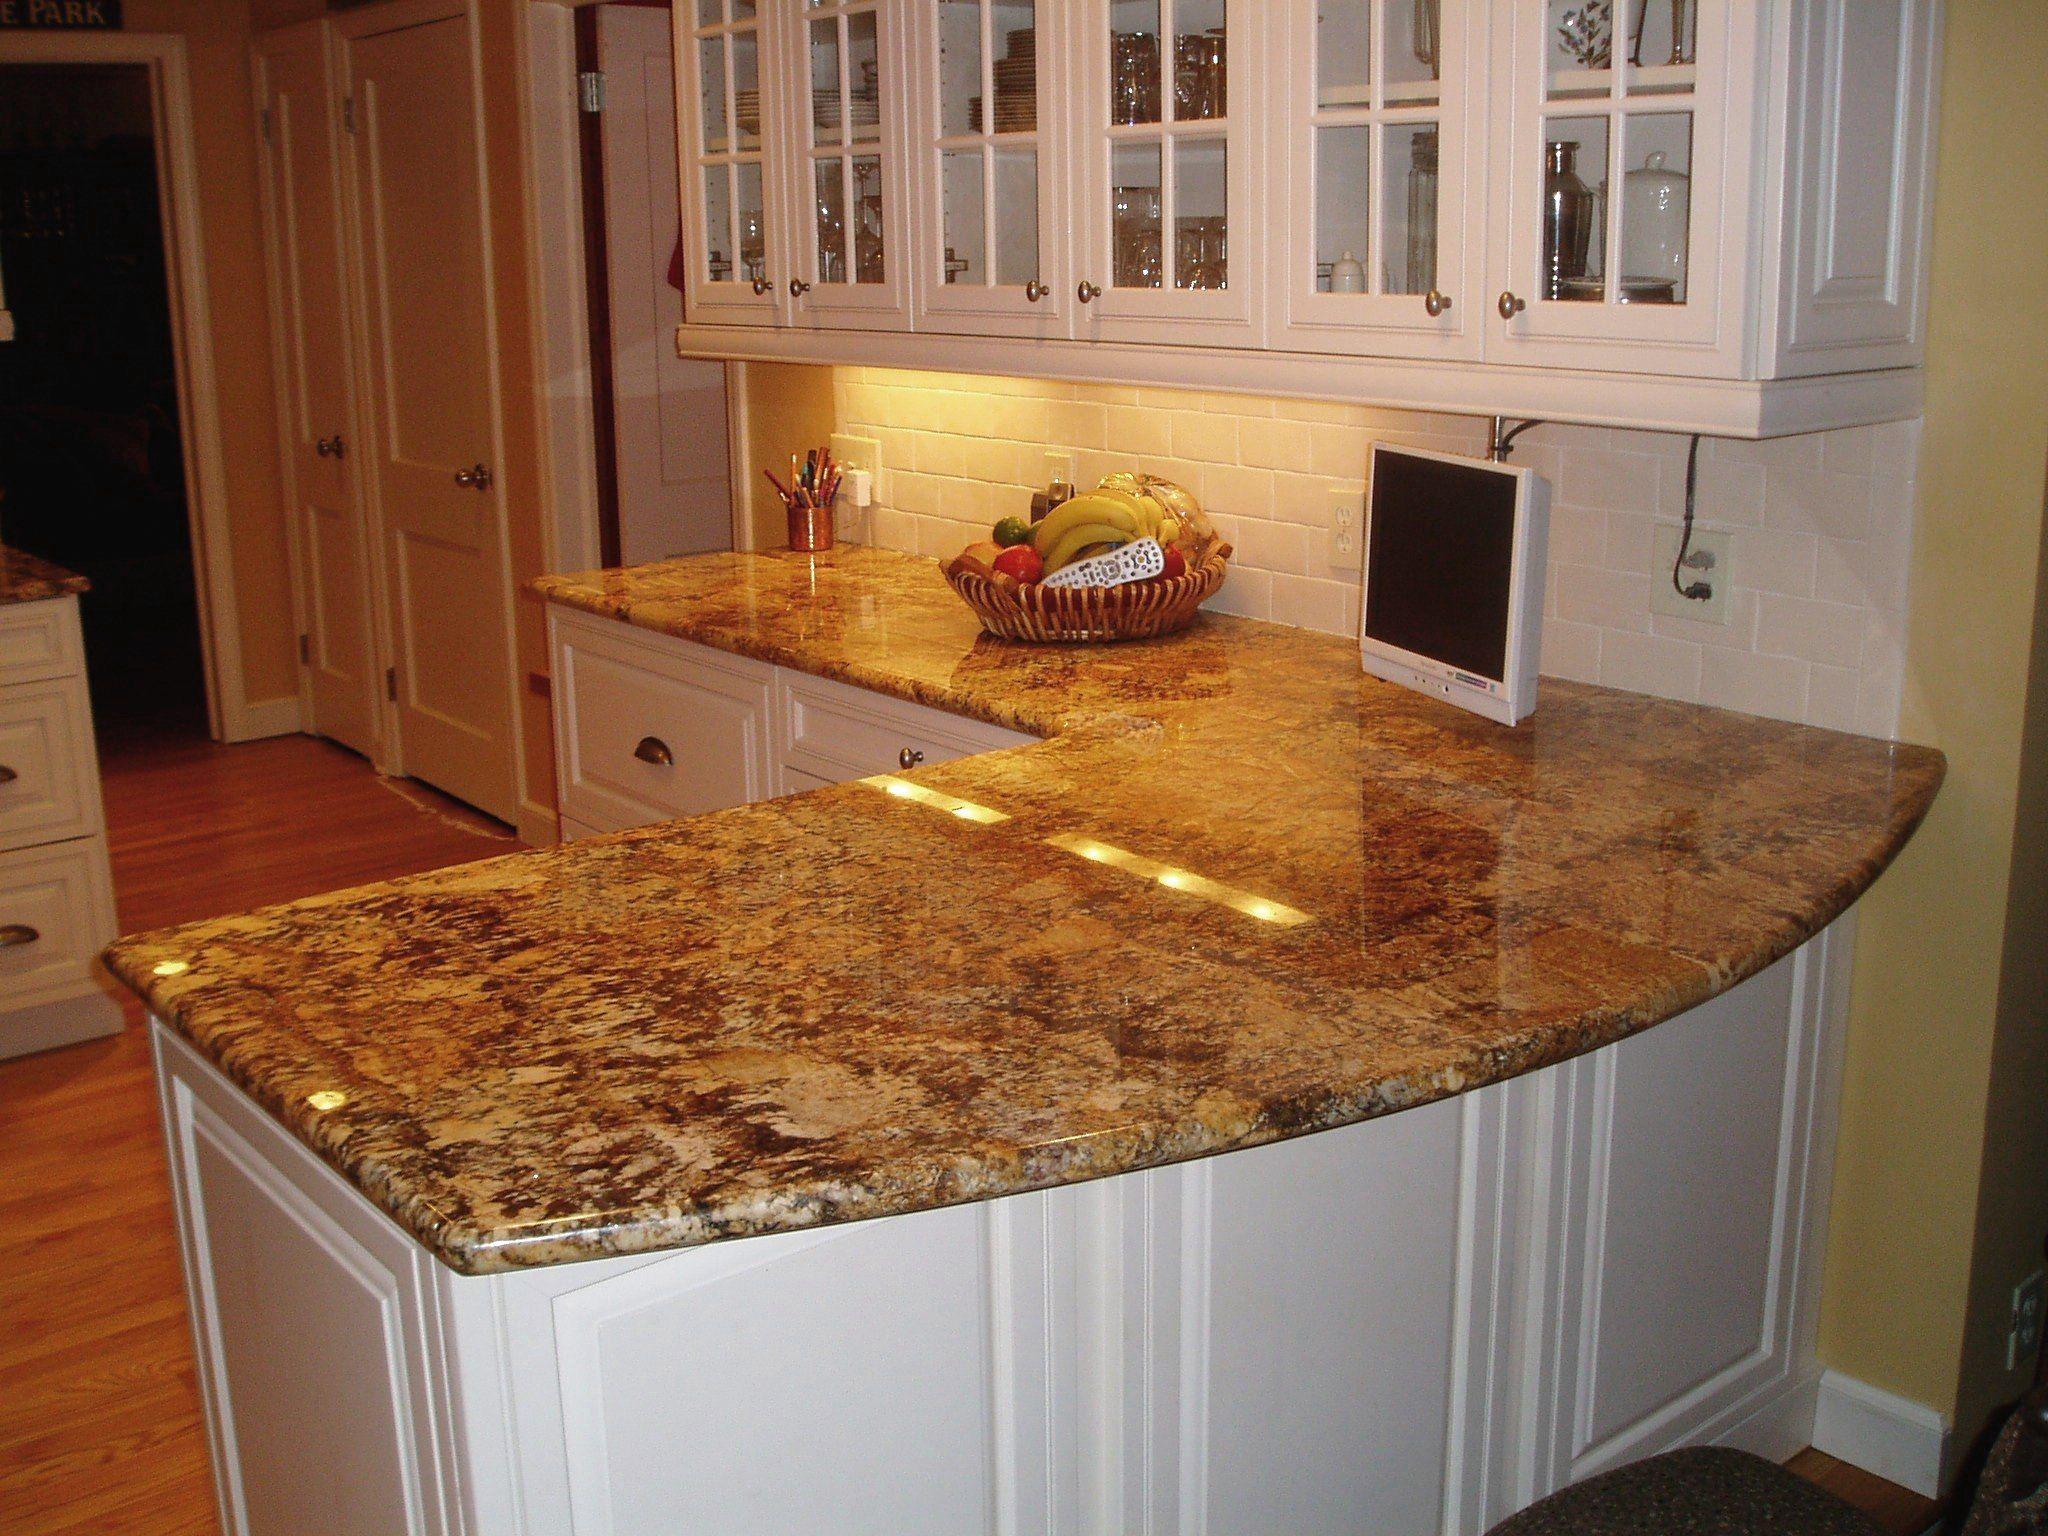 Image Of Solutions To Overcome High Price Of Granite Countertops Brown Granite Countertops Kitchen Cabinets And Granite Granite Countertops Kitchen